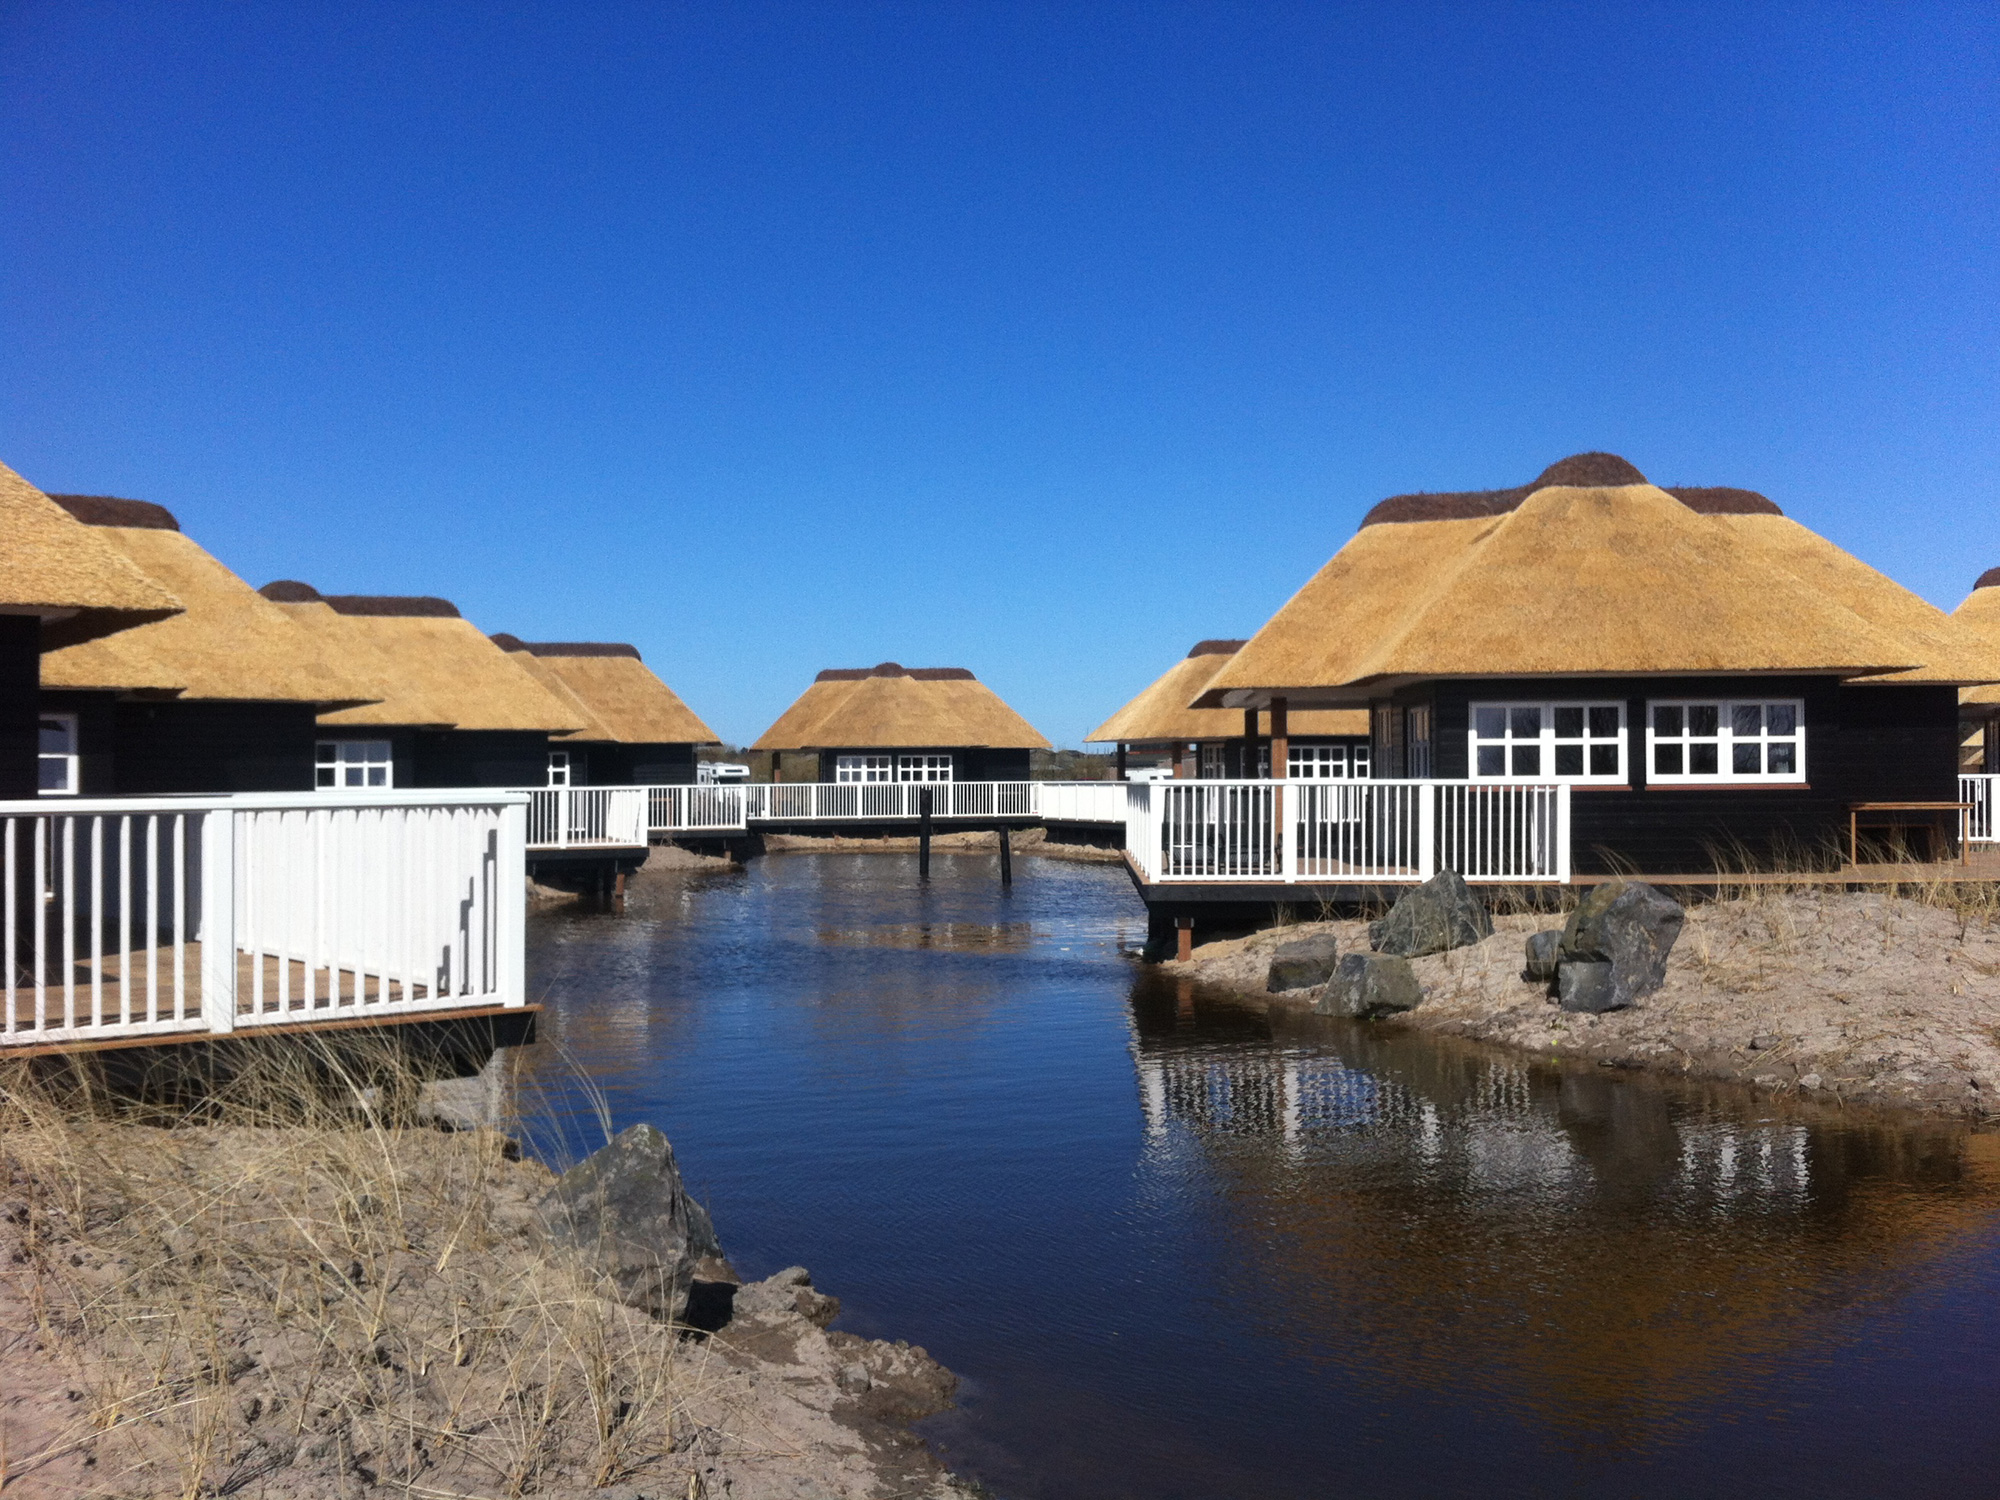 Hvidbjerg Camping